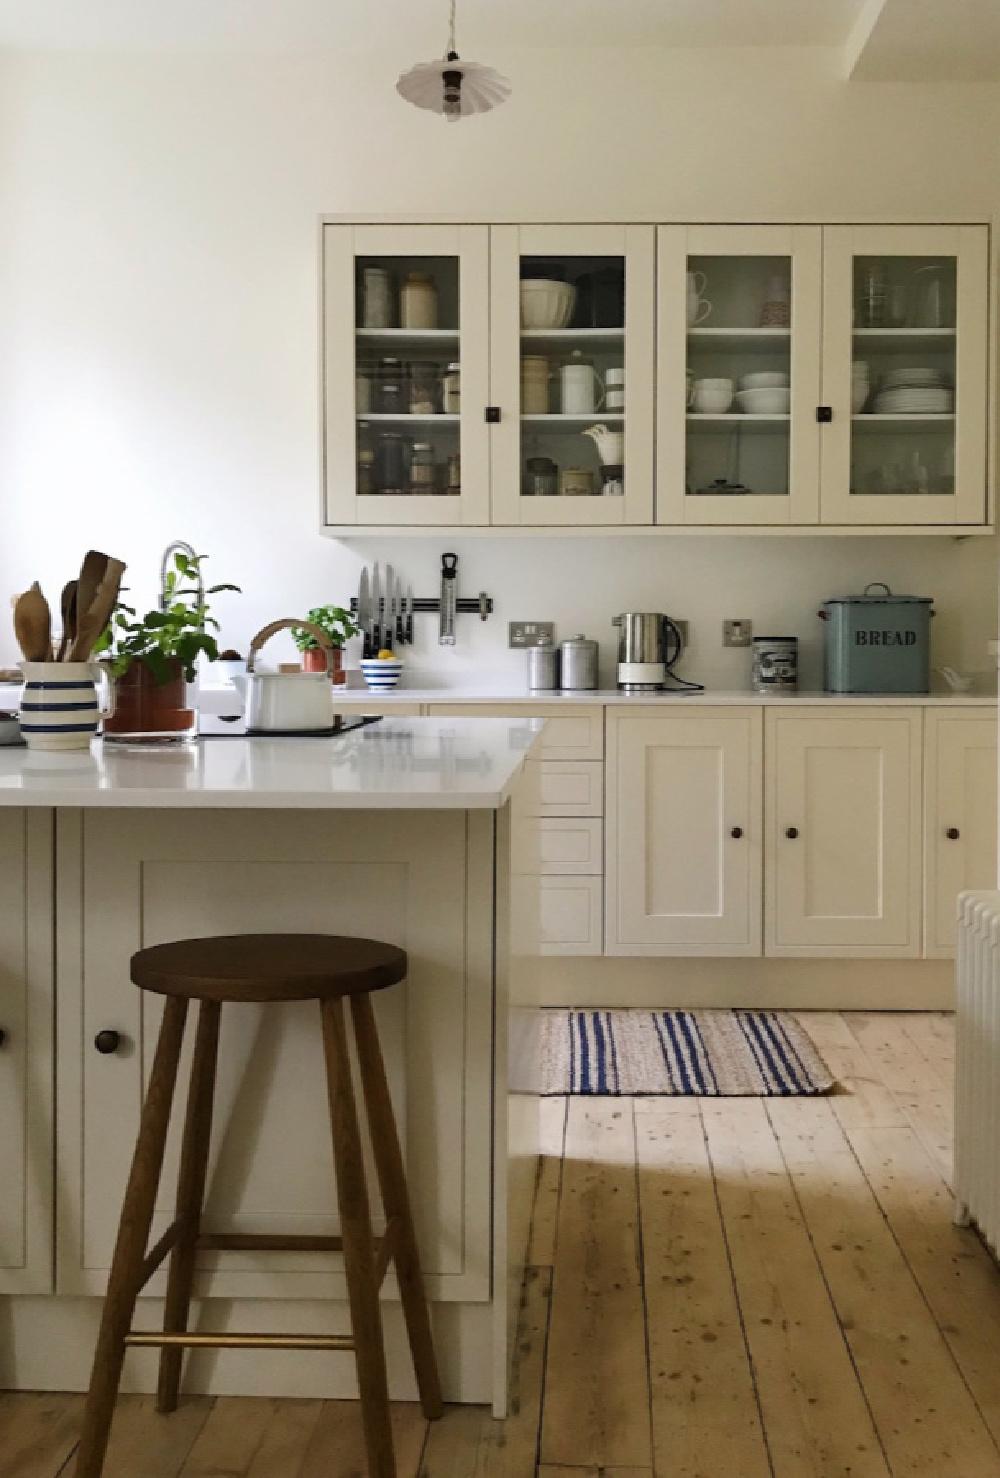 Wimborne White paint color by Farrow & Ball on walls of a glorious country kitchen by Siobhan McFadden of Homestead. #wimbornewhite #farrowandball #paintcolors #englishcountry #kitchendesign #whitepaintcolors #interiordesign